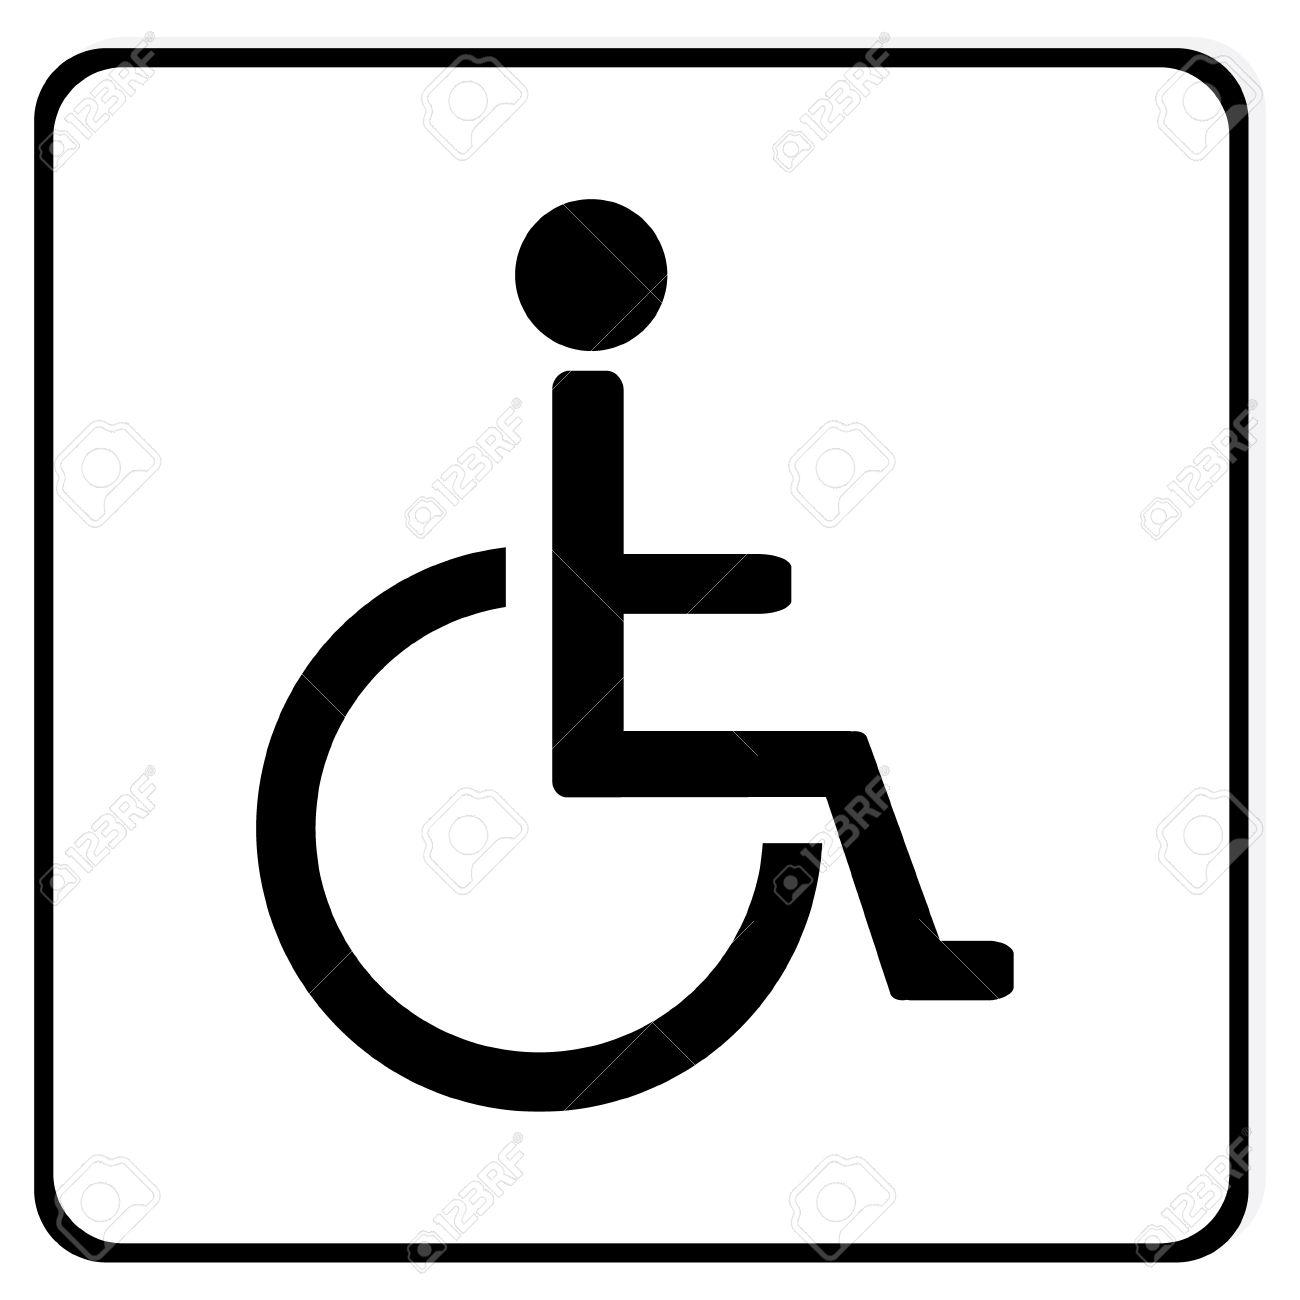 1300x1300 Thrifty Handicap Parking Symbol With Handicap Parking Symbol Photo